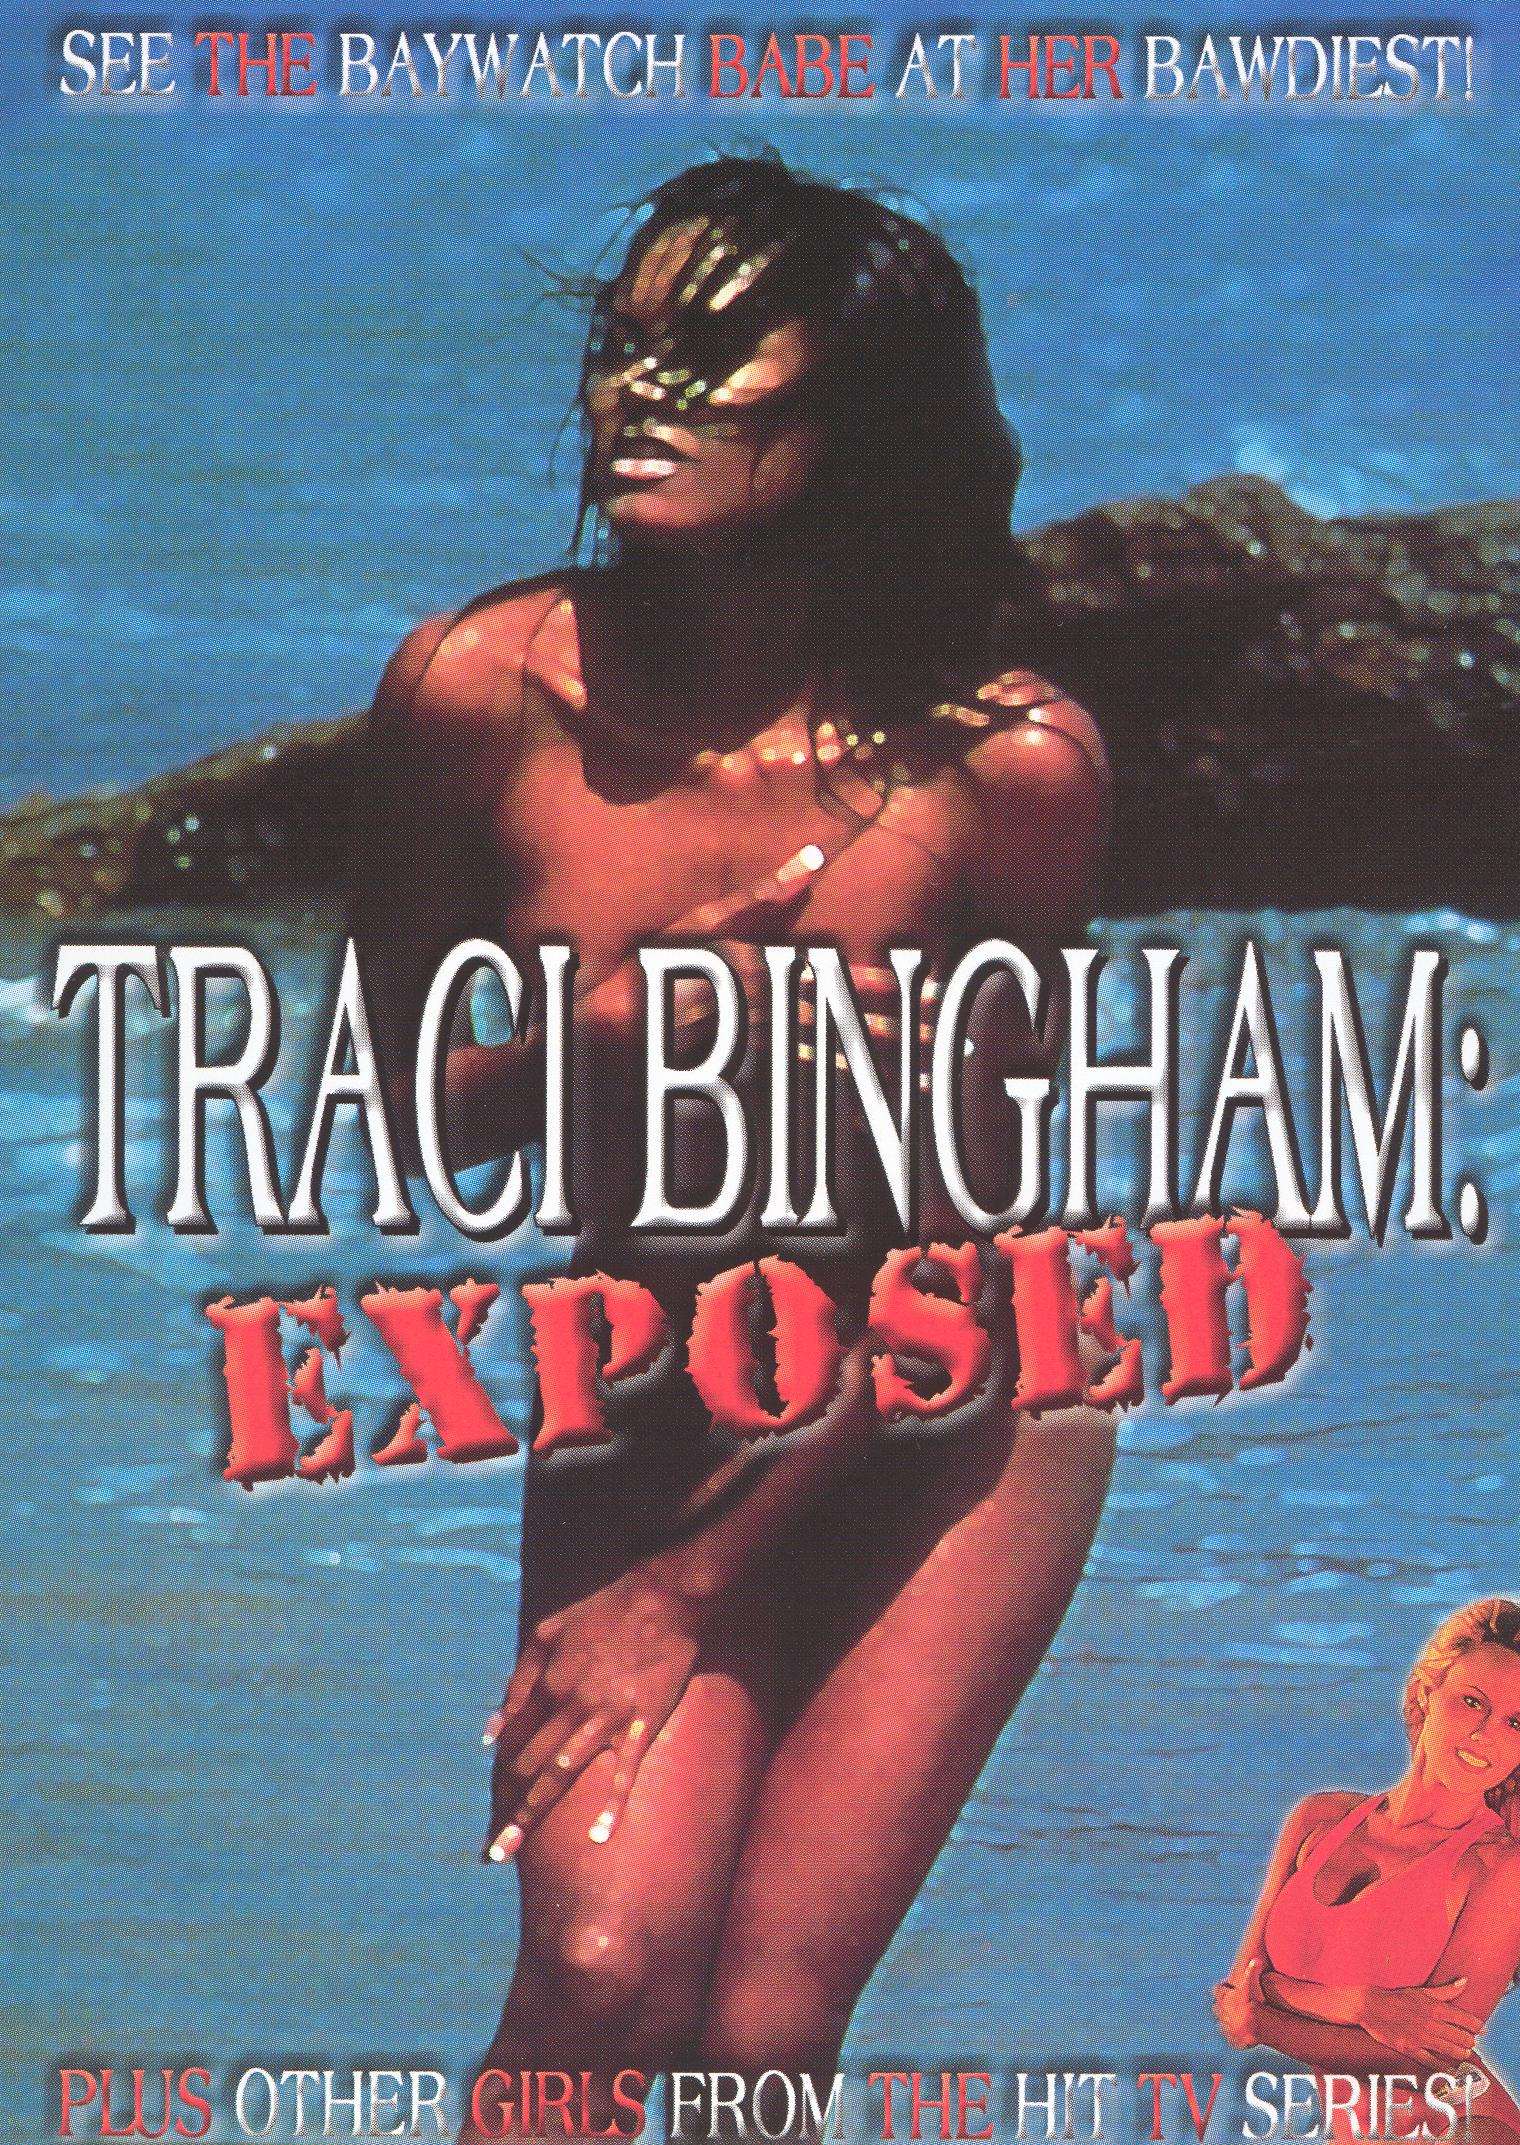 Traci Bingham Exposed